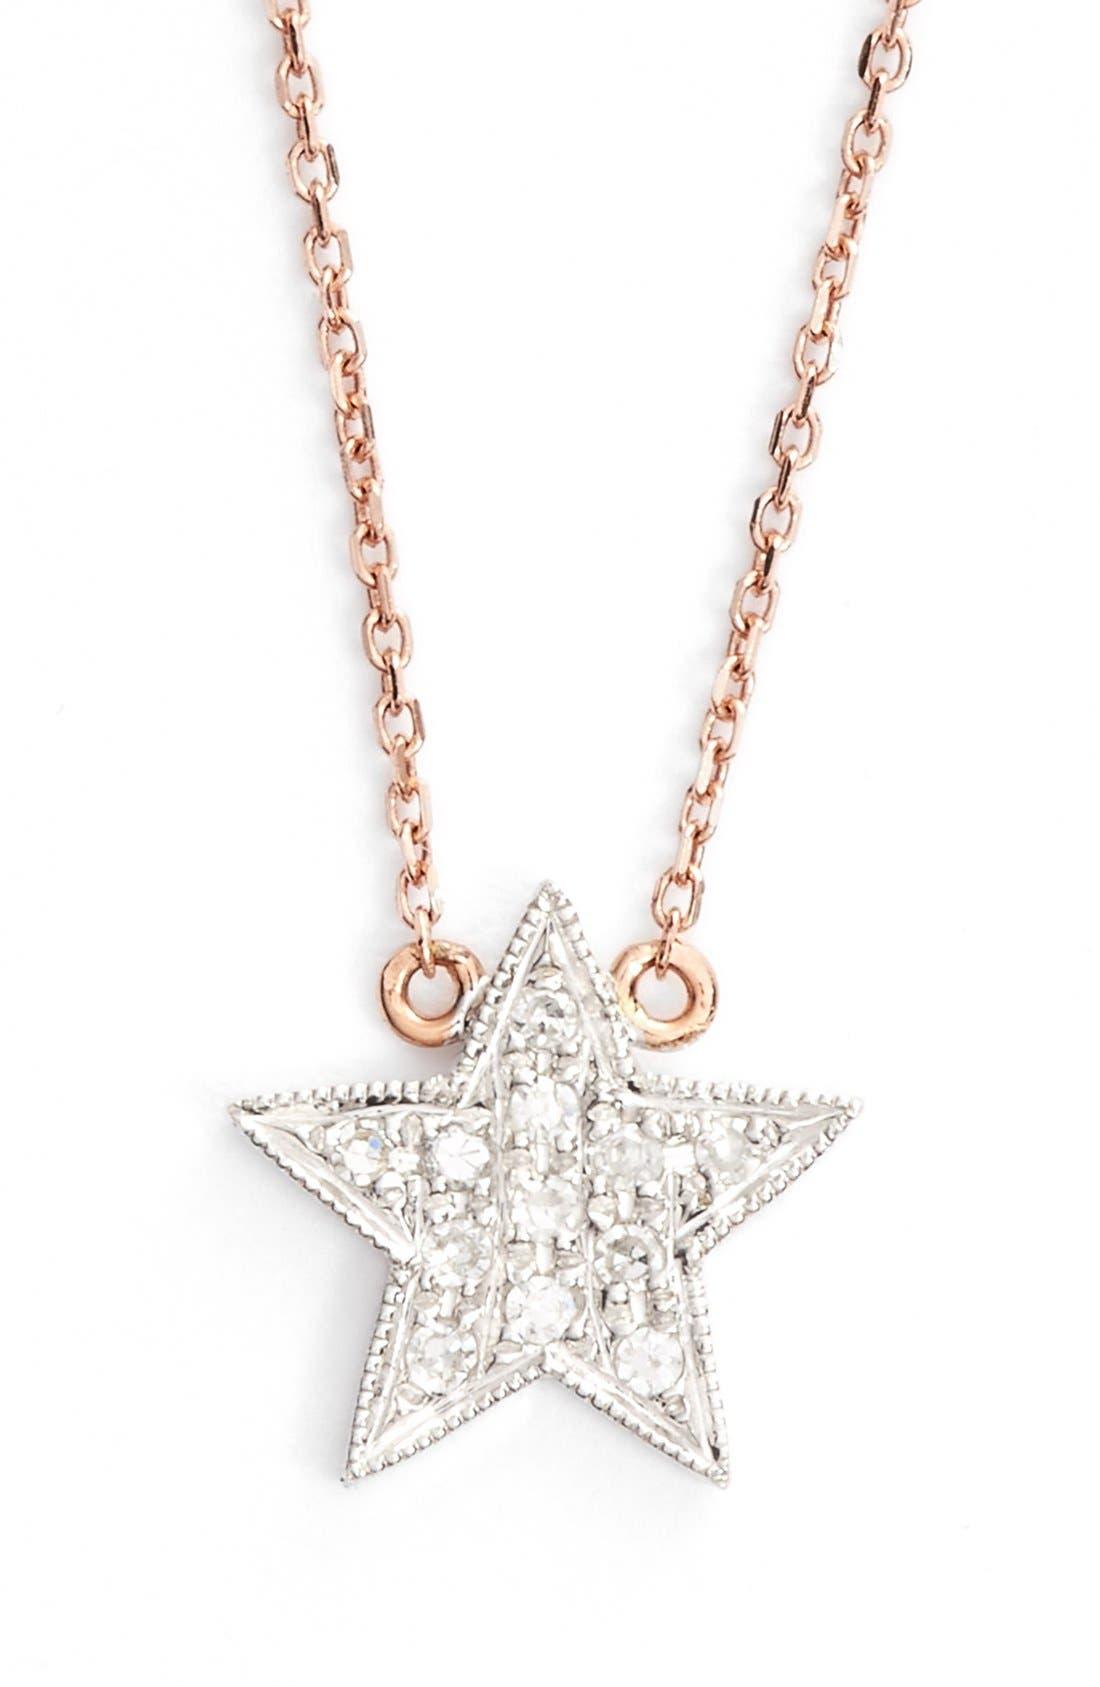 Alternate Image 1 Selected - Dana Rebecca Designs 'Julianne Himiko' Diamond Star Pendant Necklace